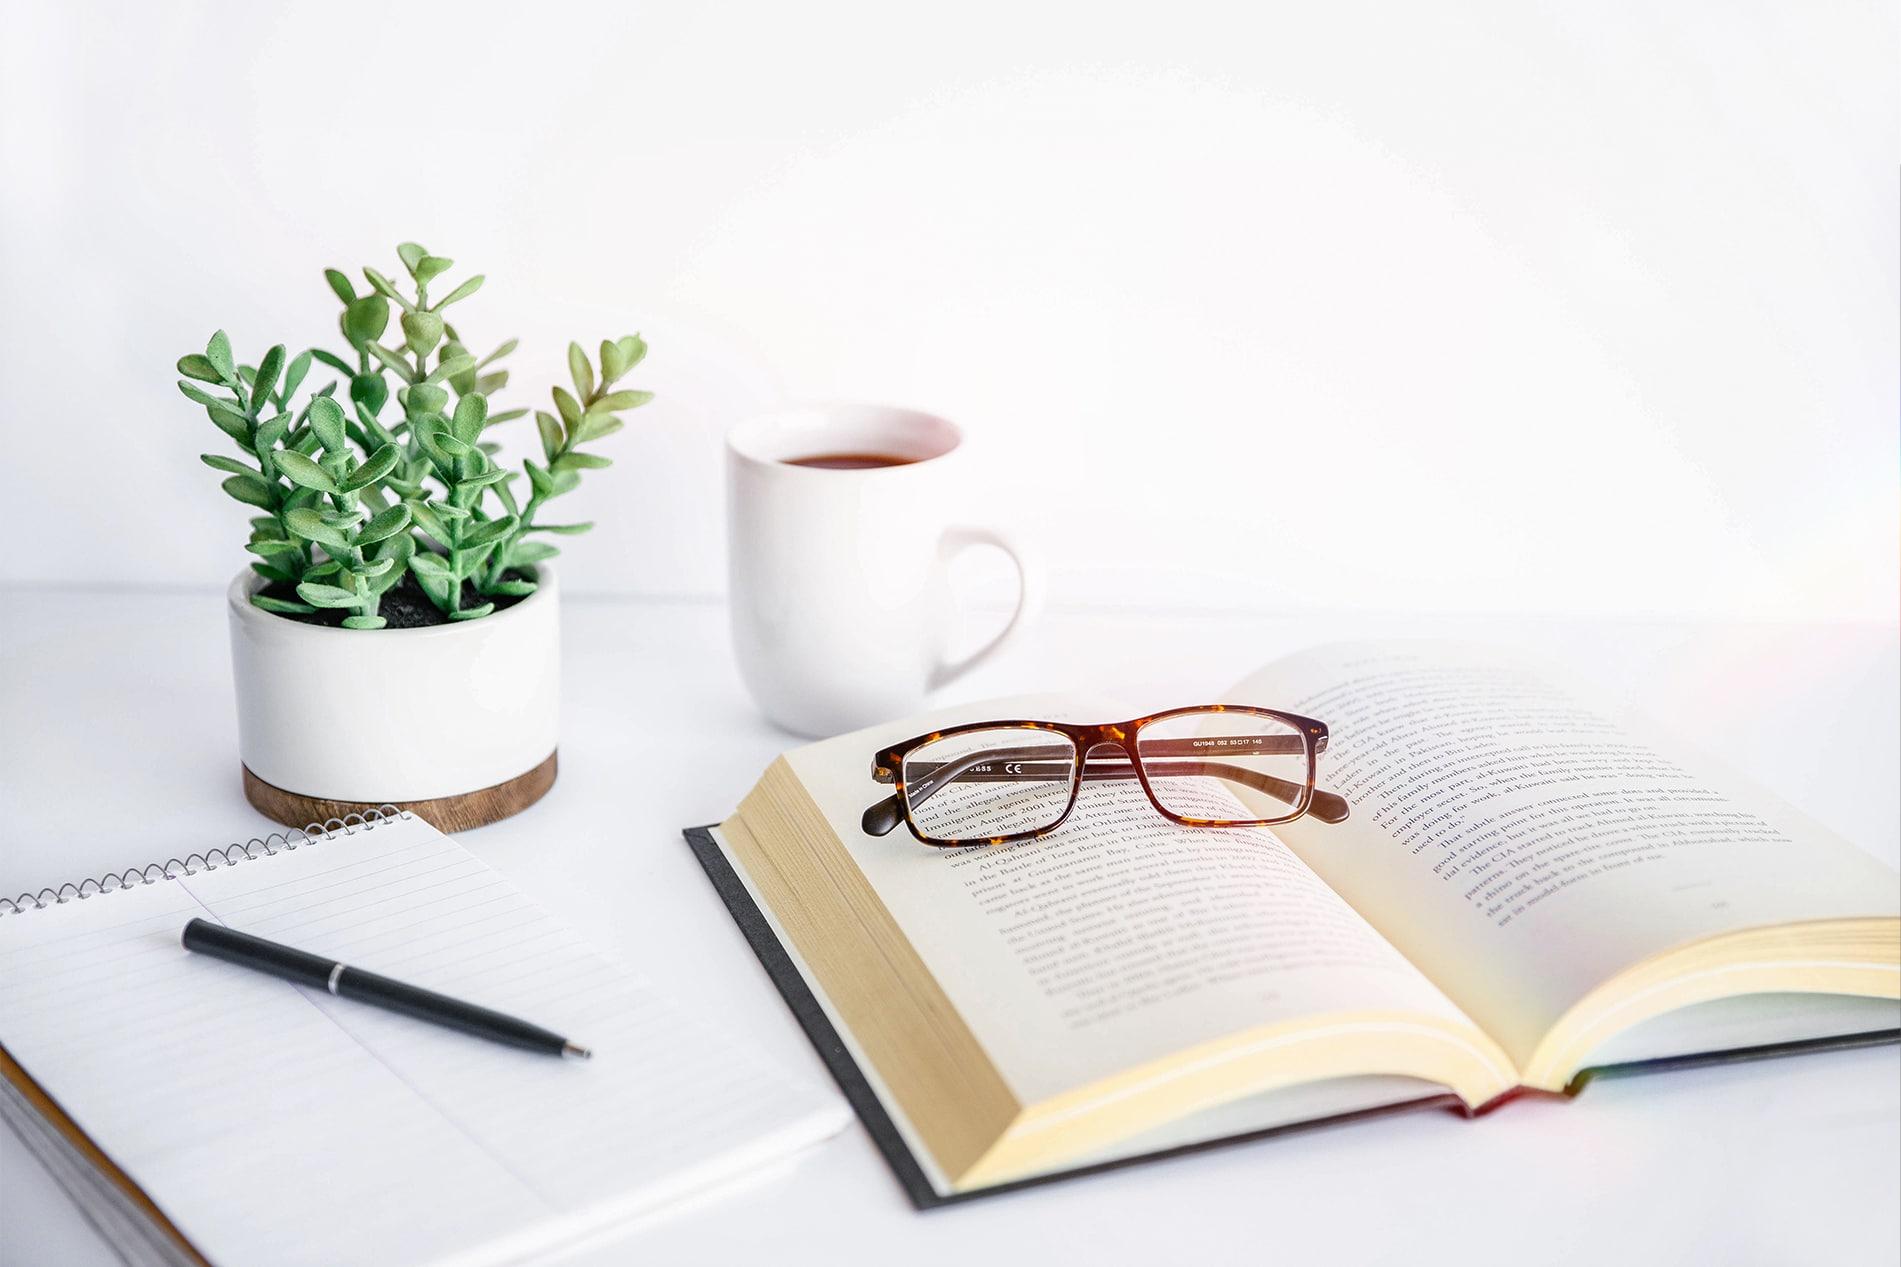 Swomolemo Blog Ablenkungen vermeiden Tipps Arbeit Alltag Zuhause smart produktiv